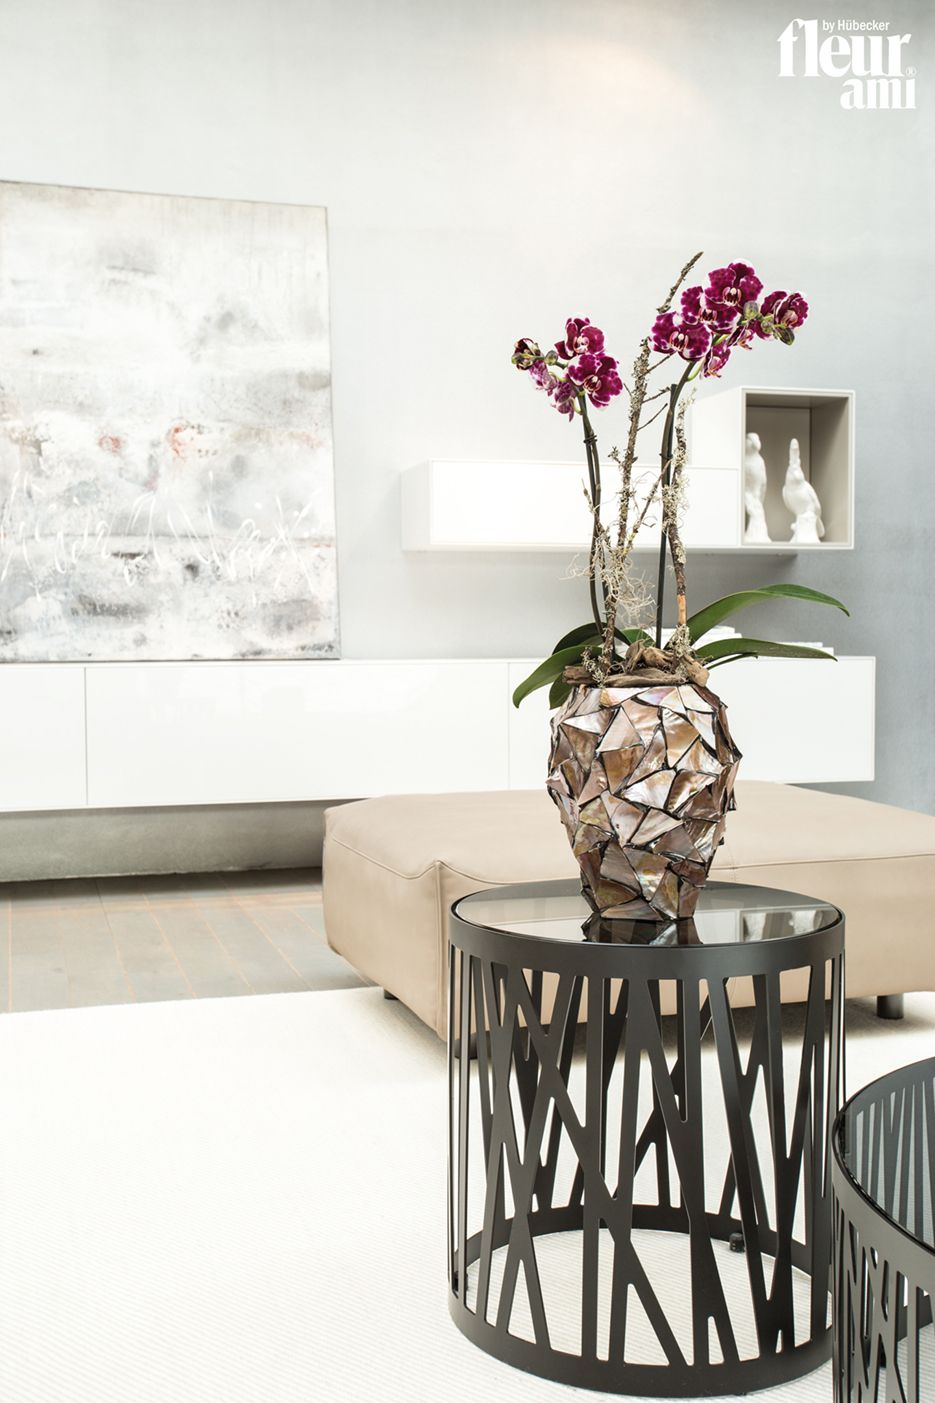 shell orchid vase by fleur ami muschel orchideen topf von fleur ami muschel pflanzgef e. Black Bedroom Furniture Sets. Home Design Ideas